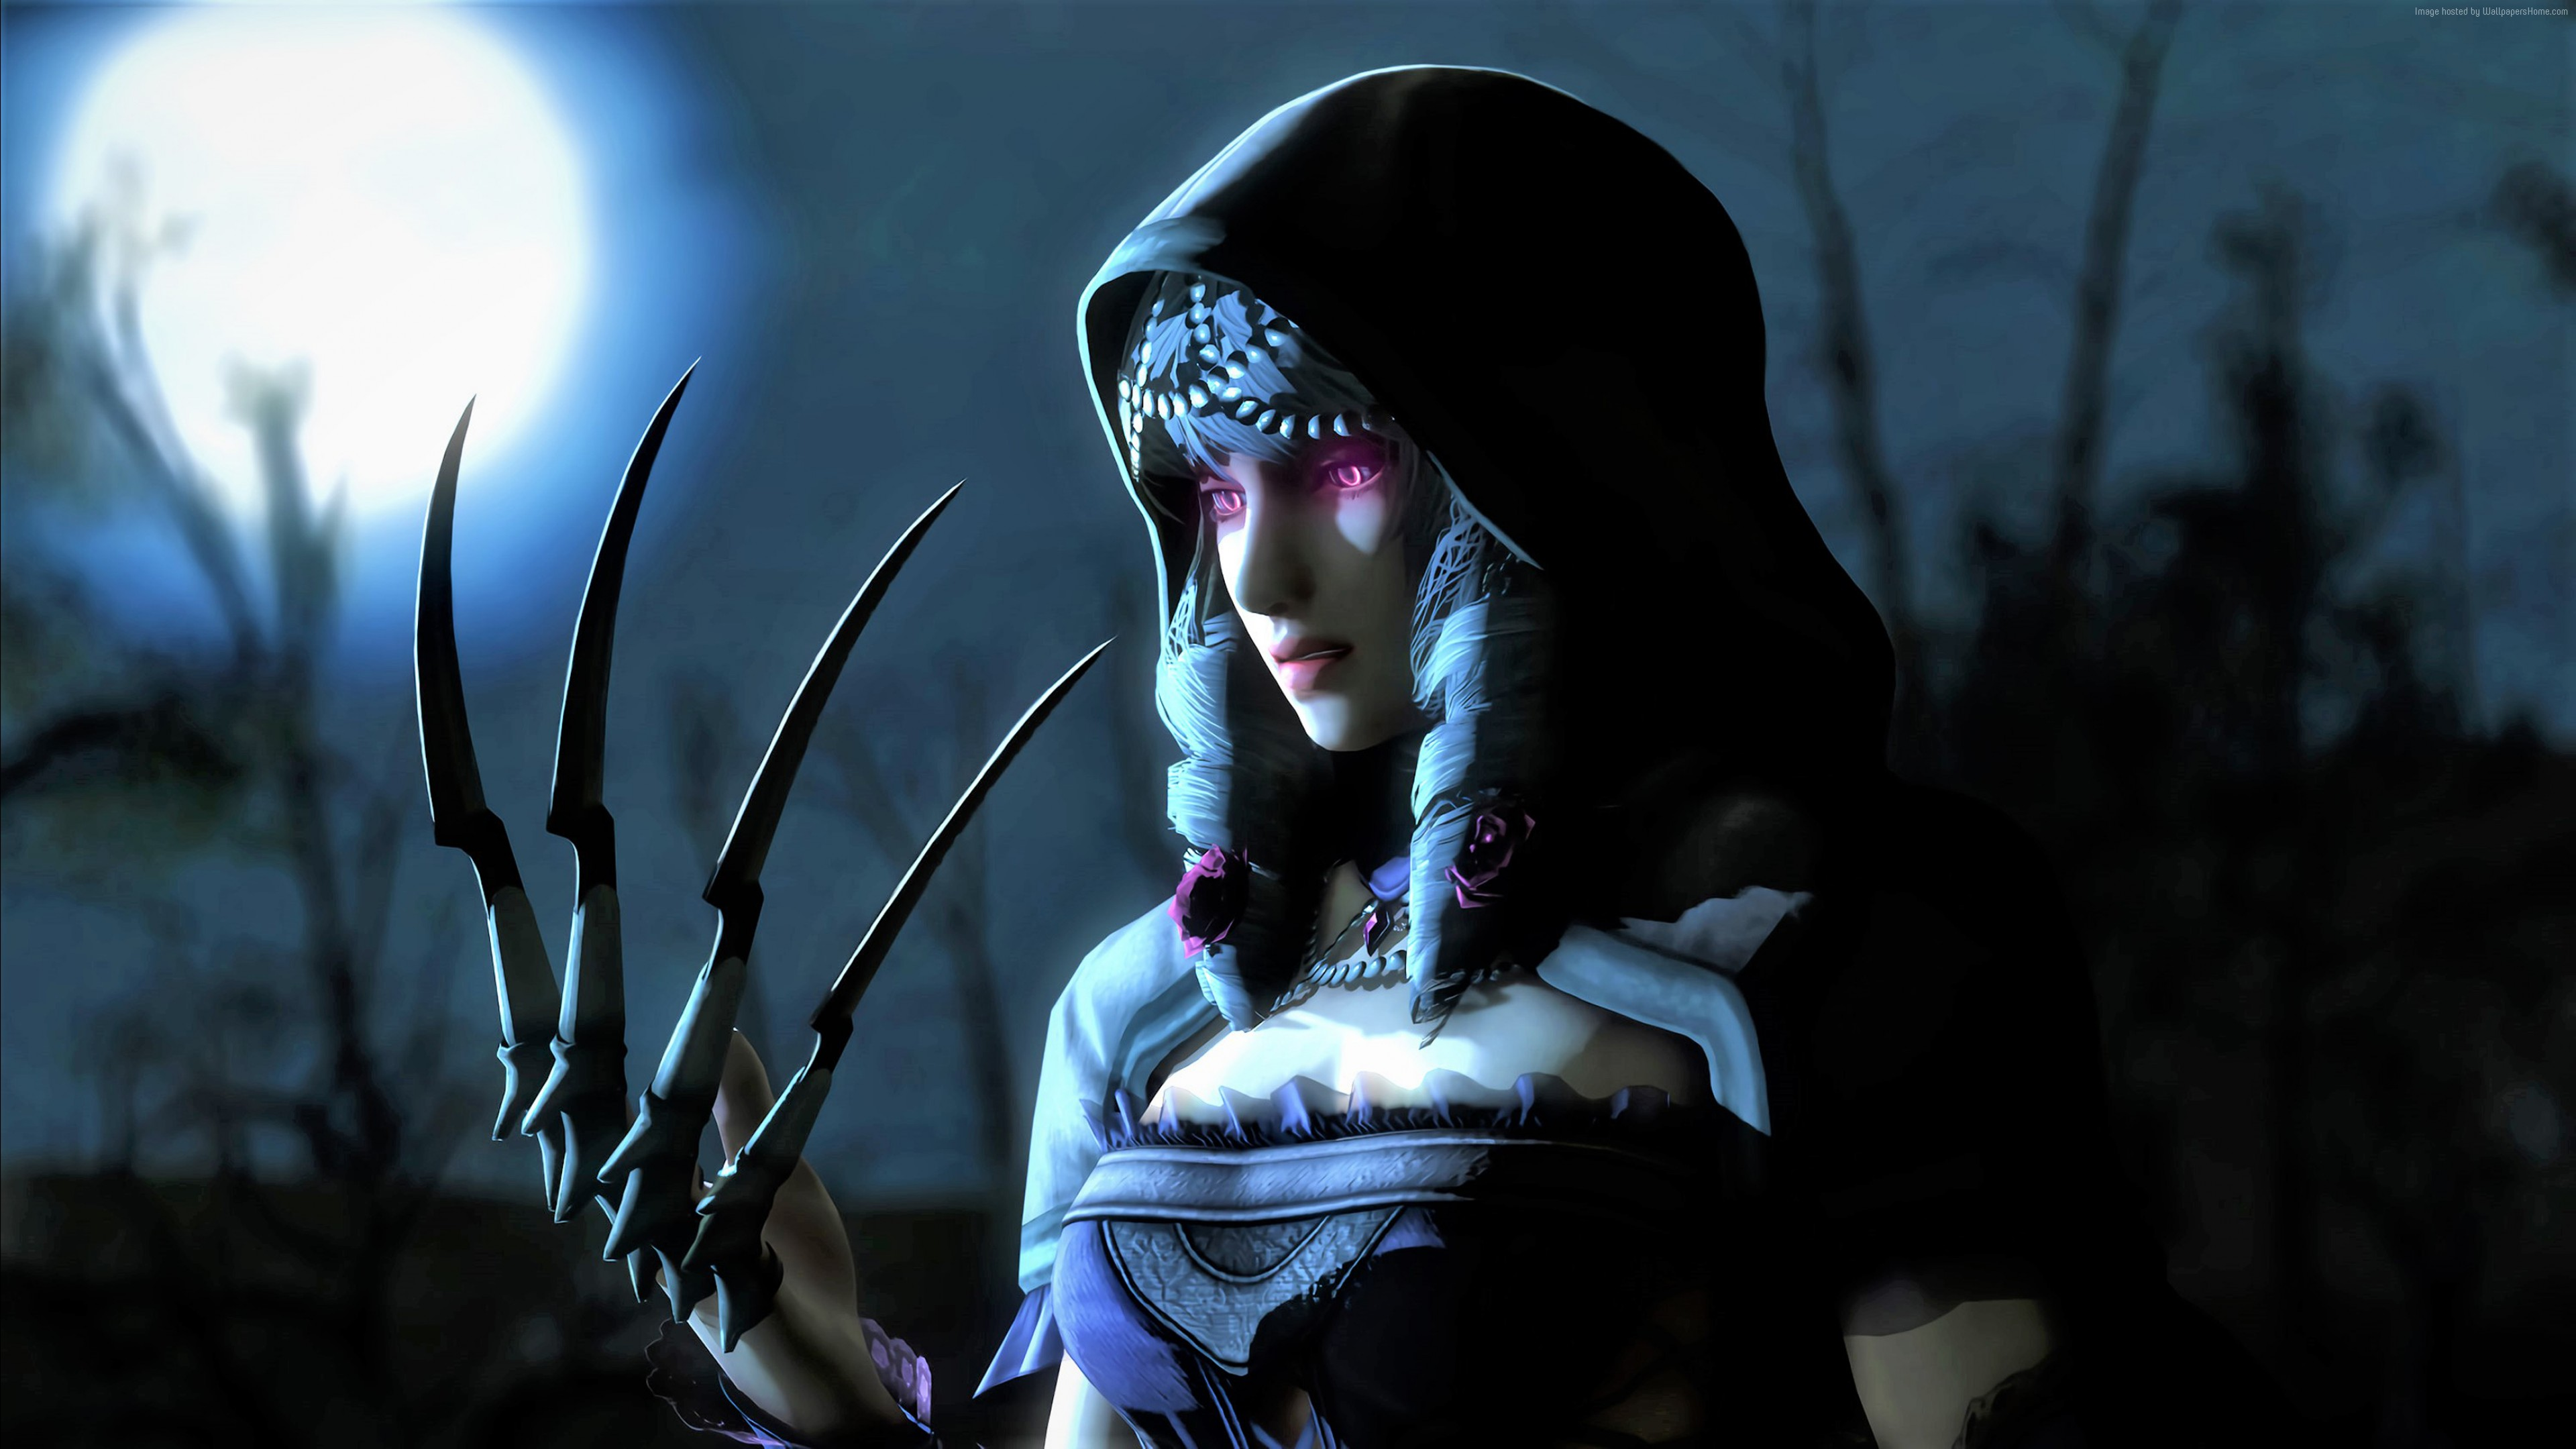 Wallpaper Warrior Girl Dark 4k Art Wallpaper Download